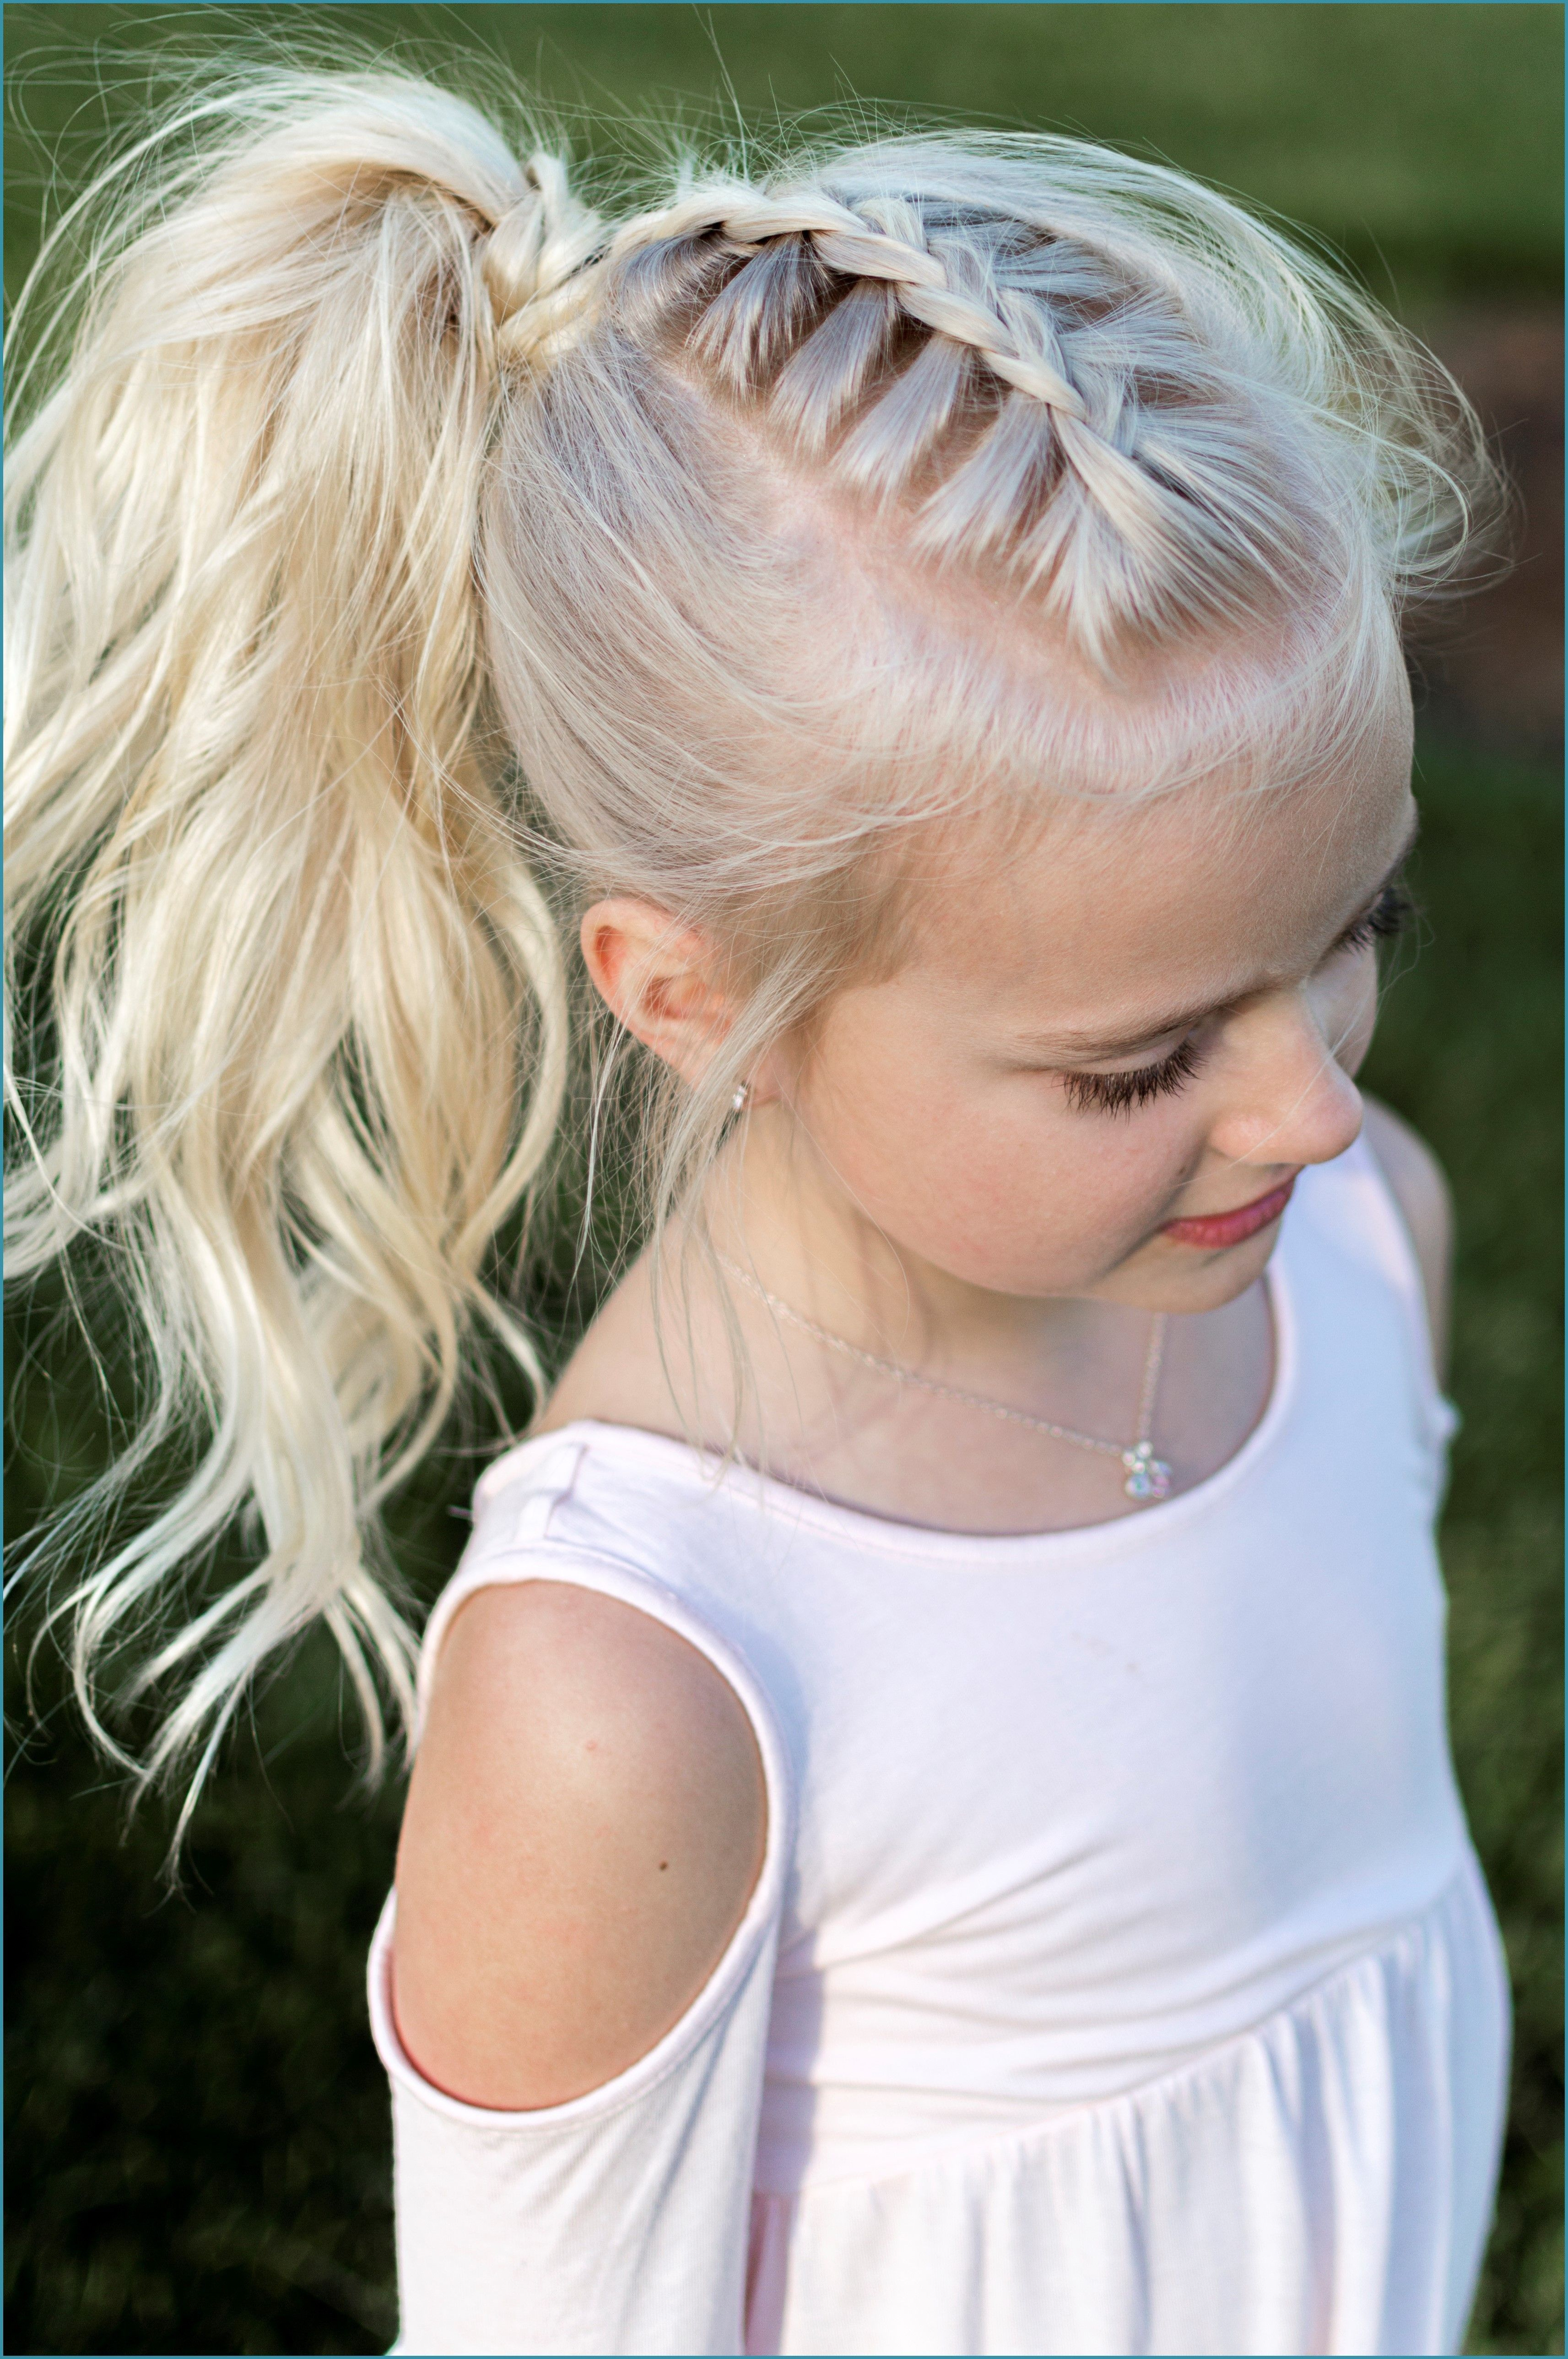 Adorable toddler Girl Hairstyles Baby Girl Hairstyles for Short Hair 30 Adorable toddler Girl